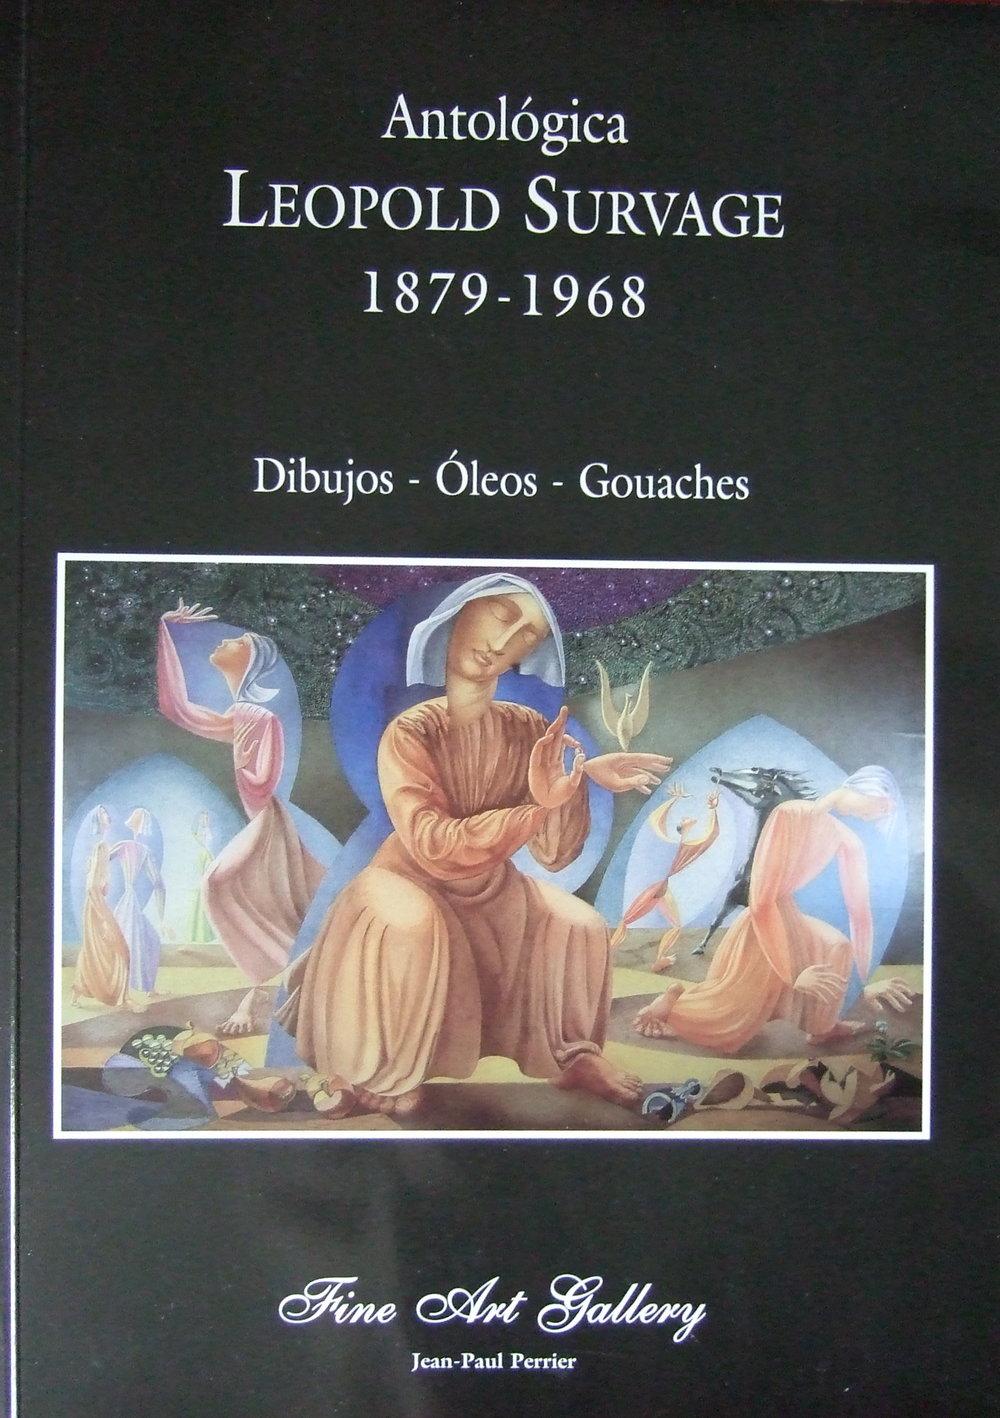 Antologica Leopold Survage 1879 - 1968